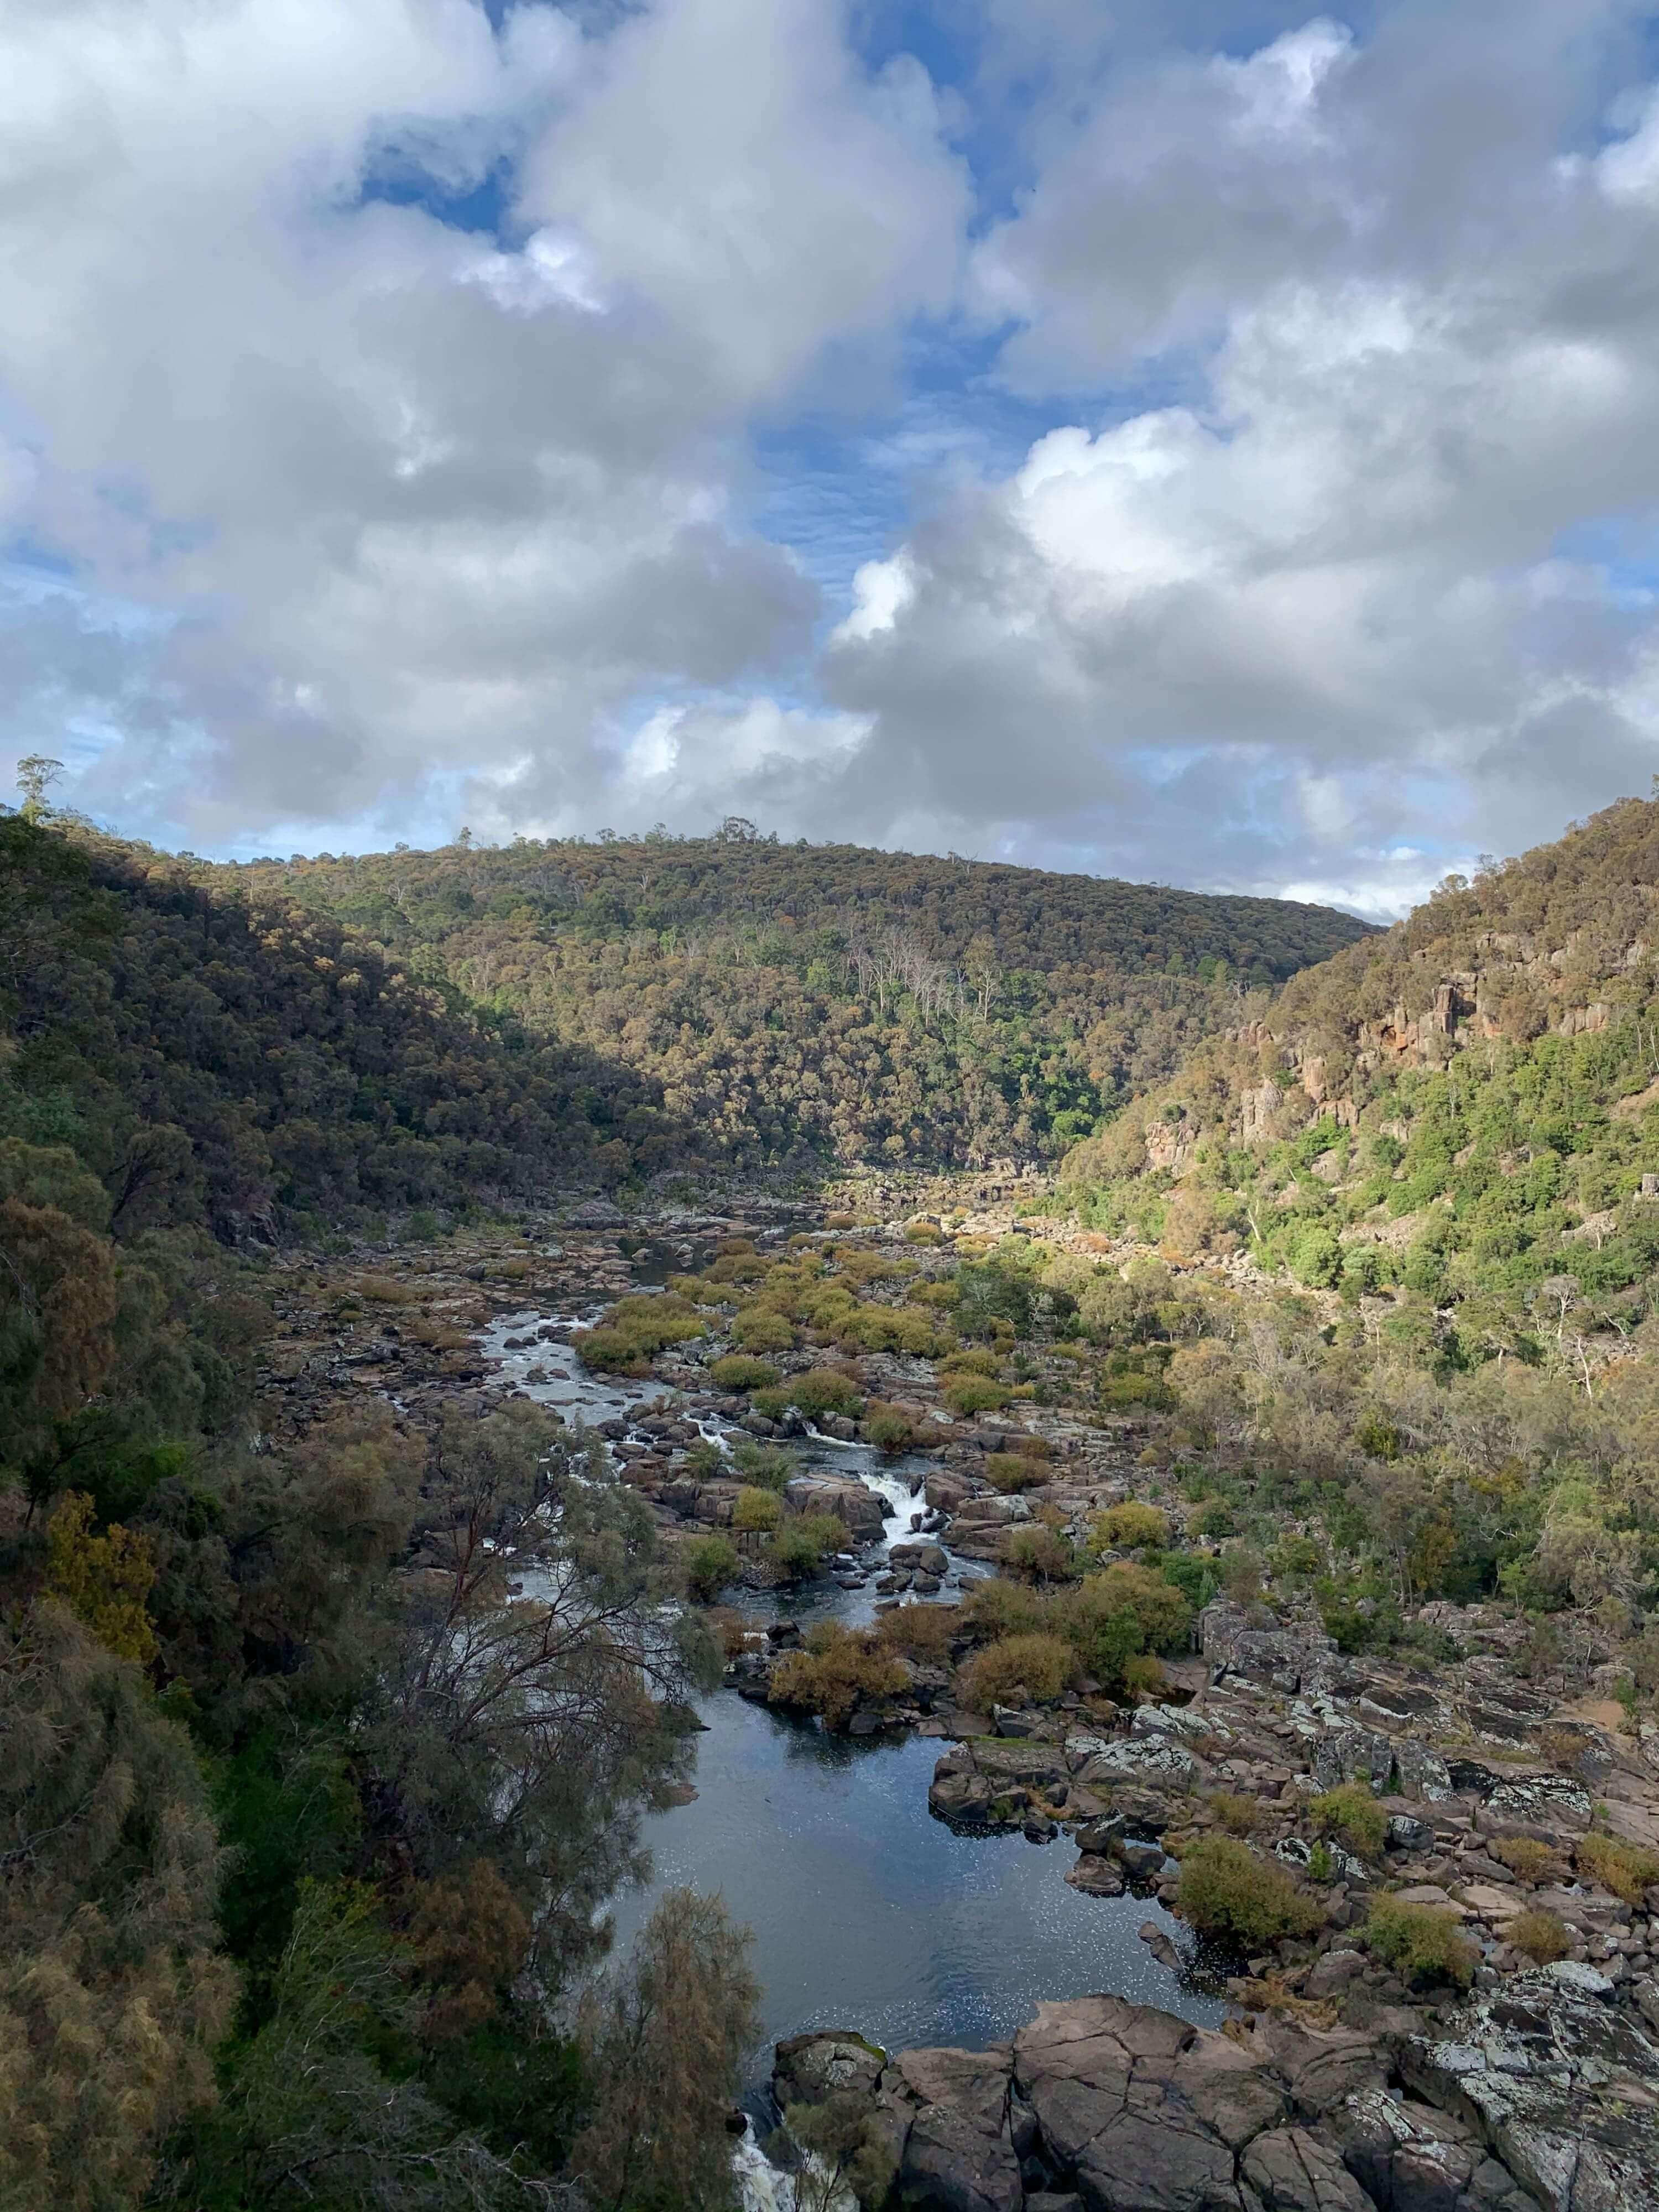 photo of the South Esk river running through the Cataract Gorge in   Launceston, Tasmania